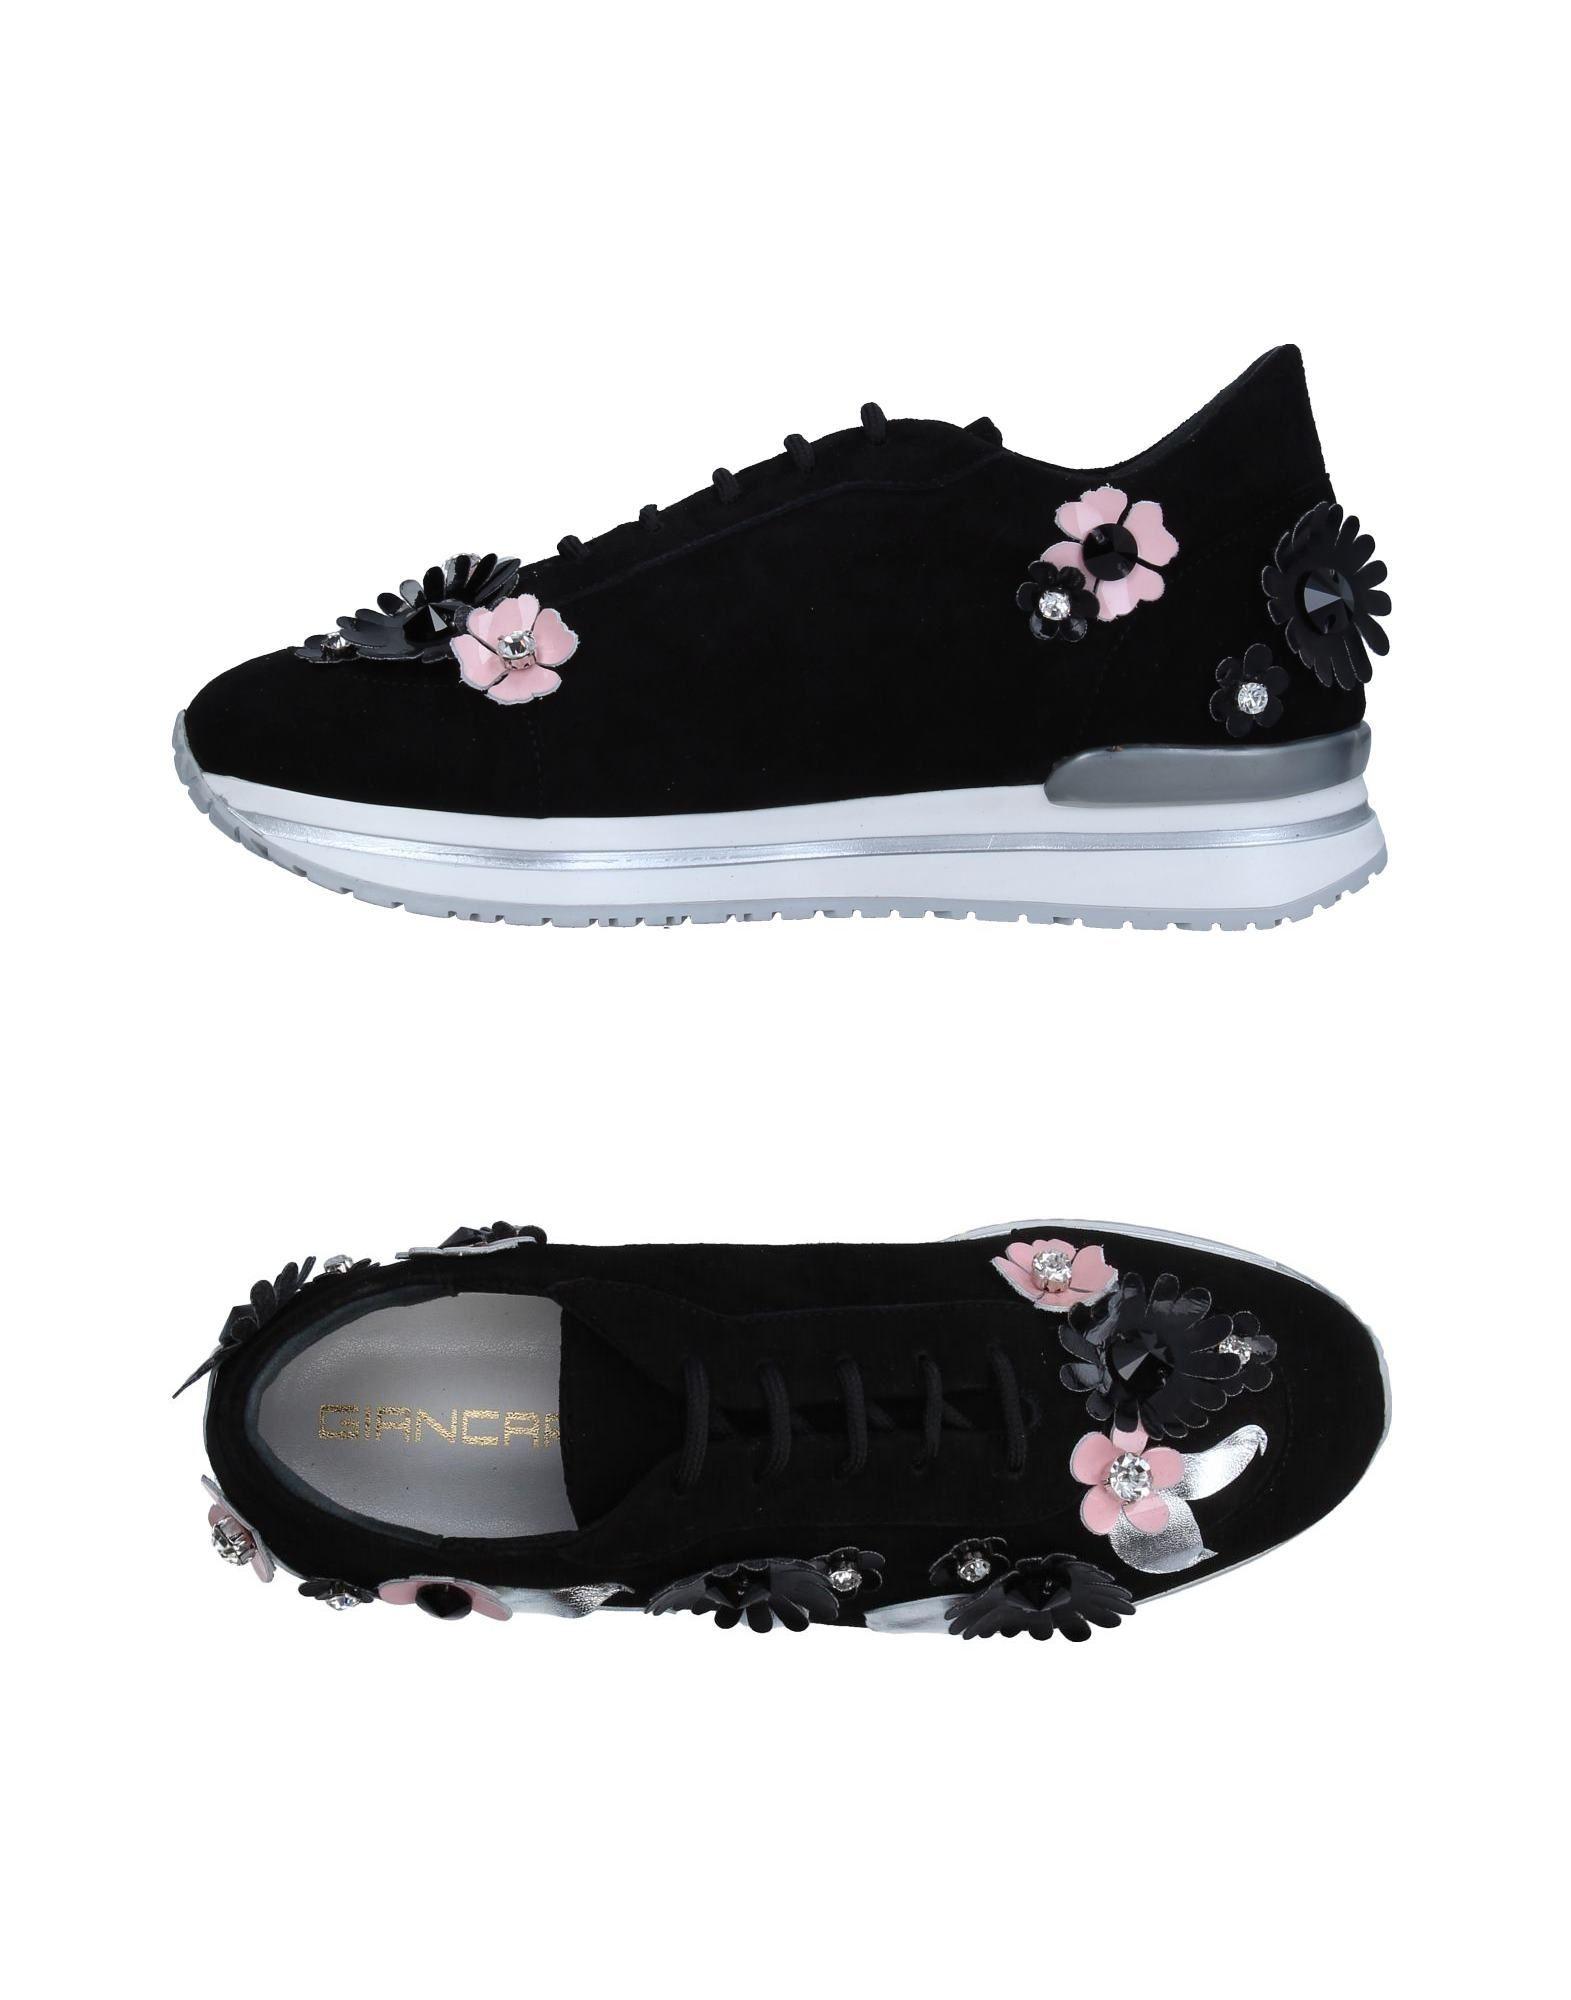 Giancarlo Paoli Sneakers Damen  11337177PG Gute Qualität beliebte Schuhe